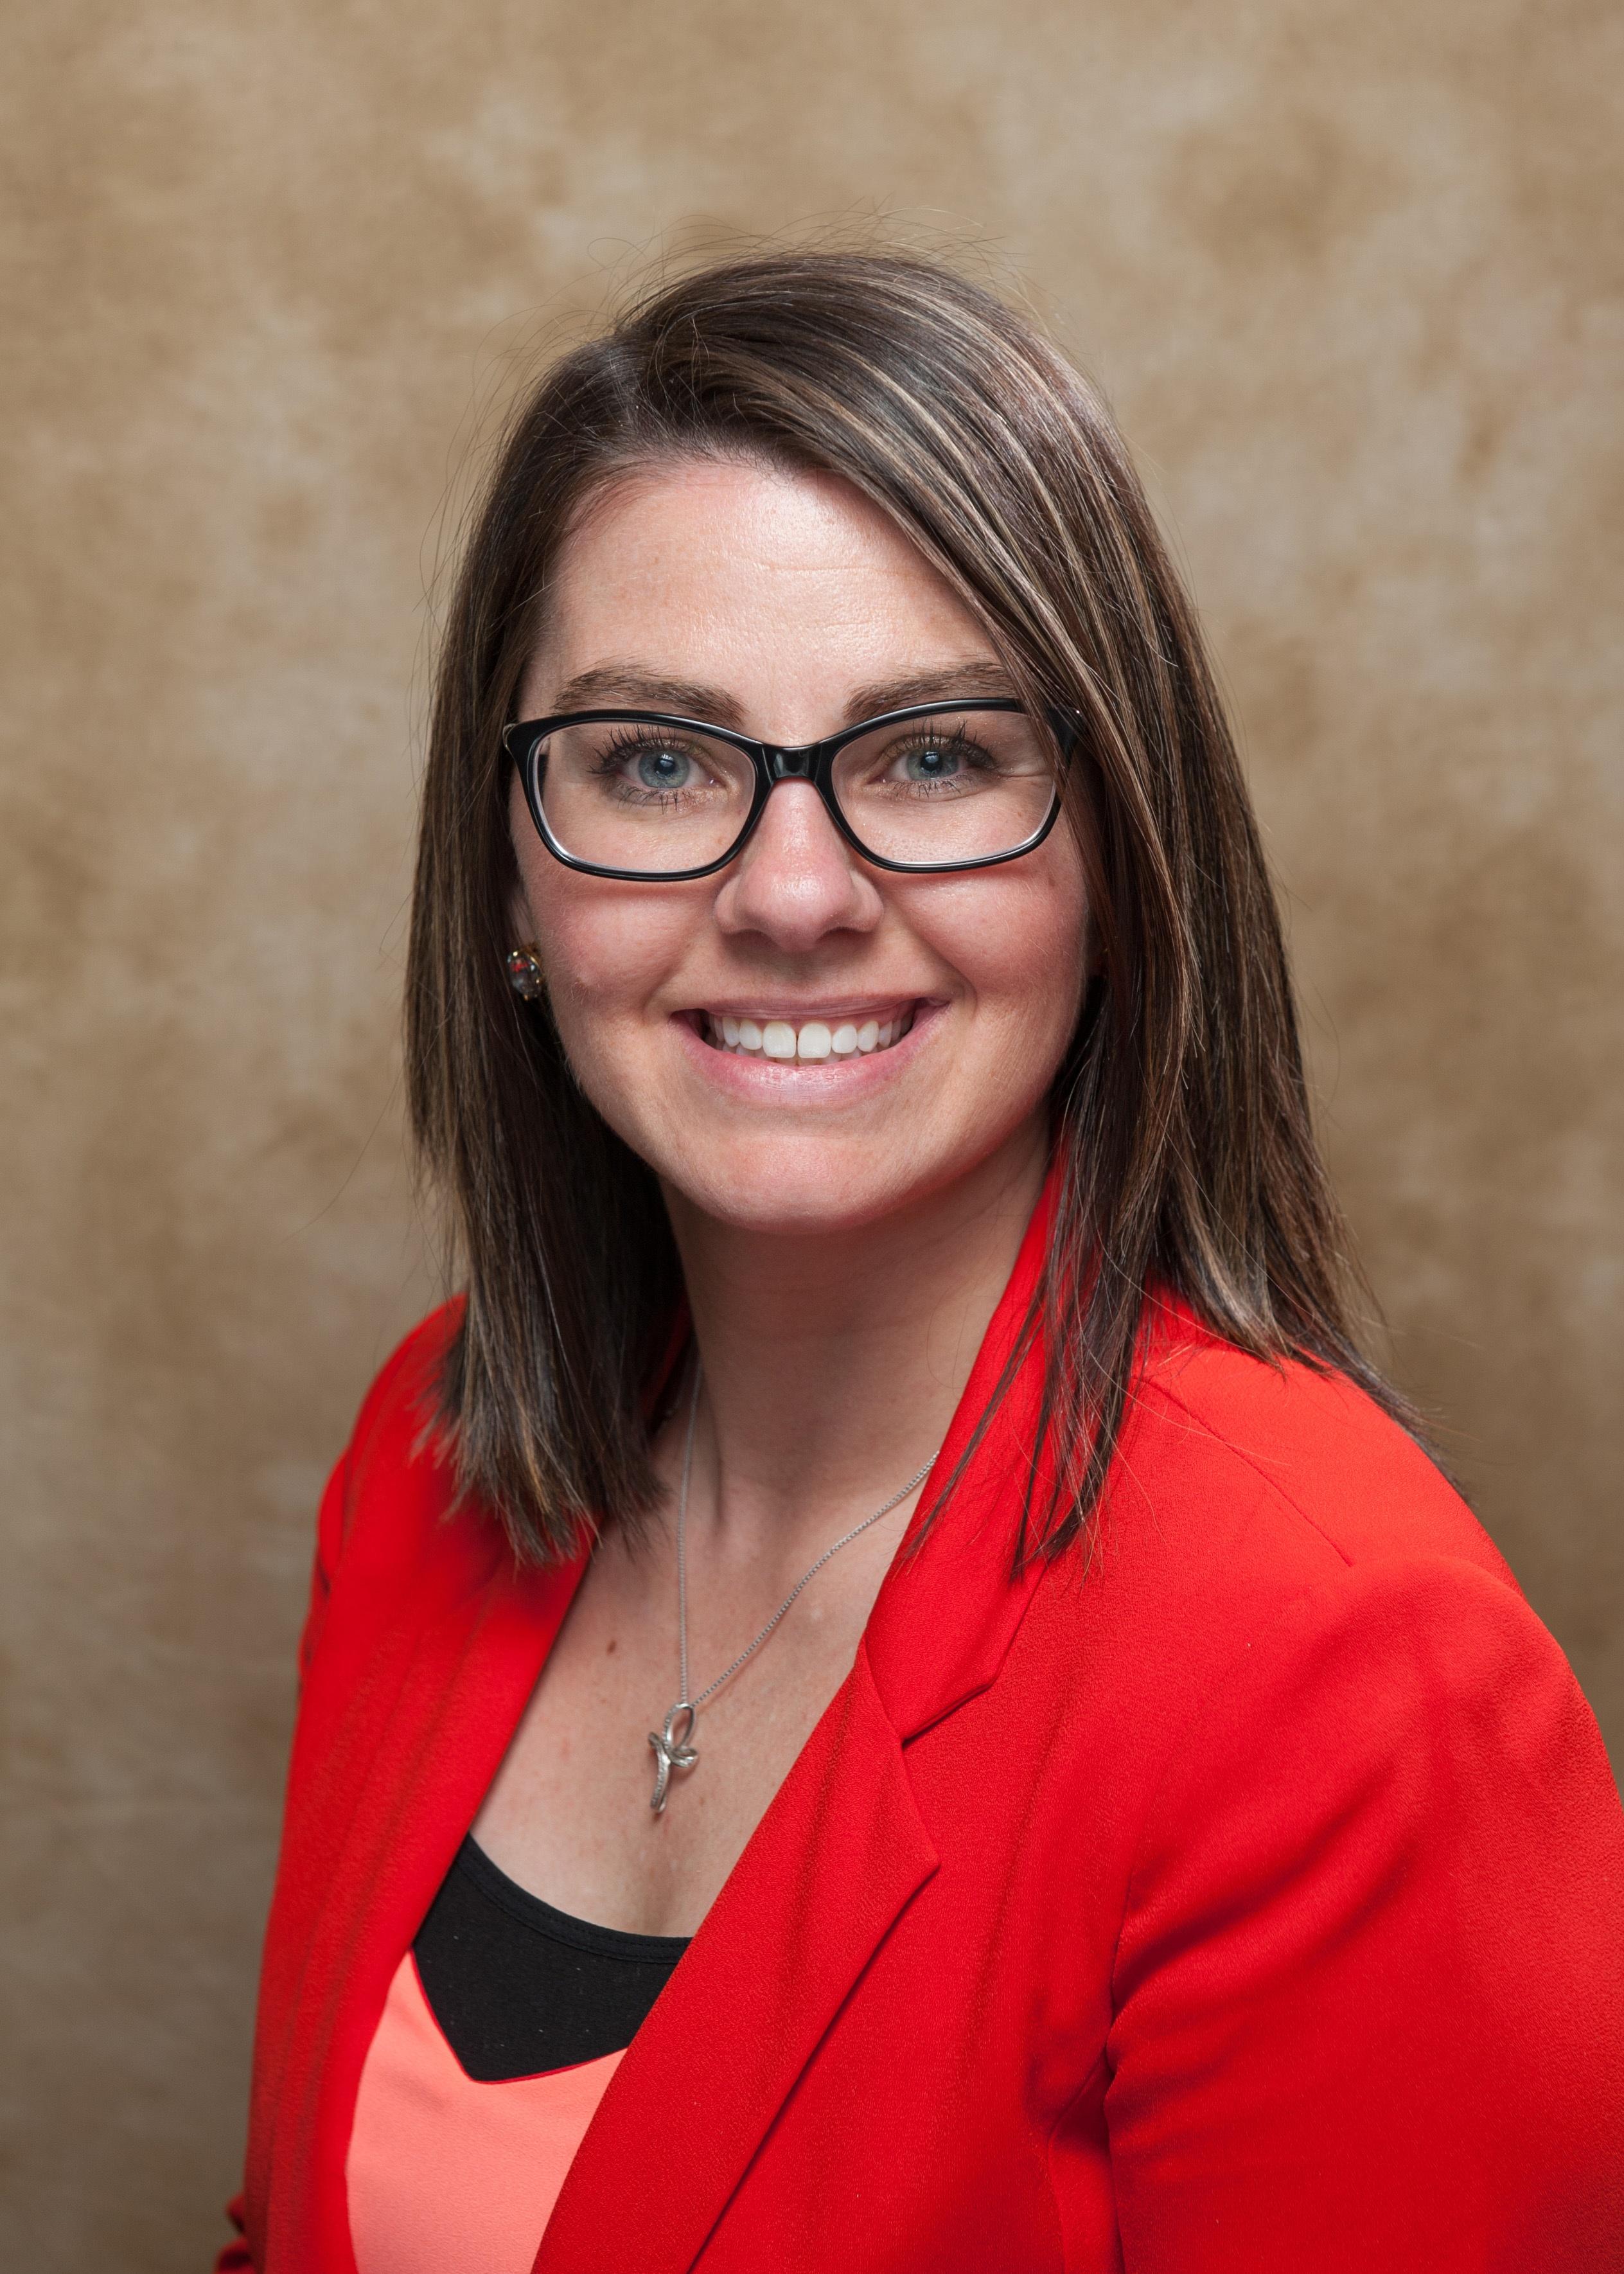 Dr. Amber G. Dunn, O.D